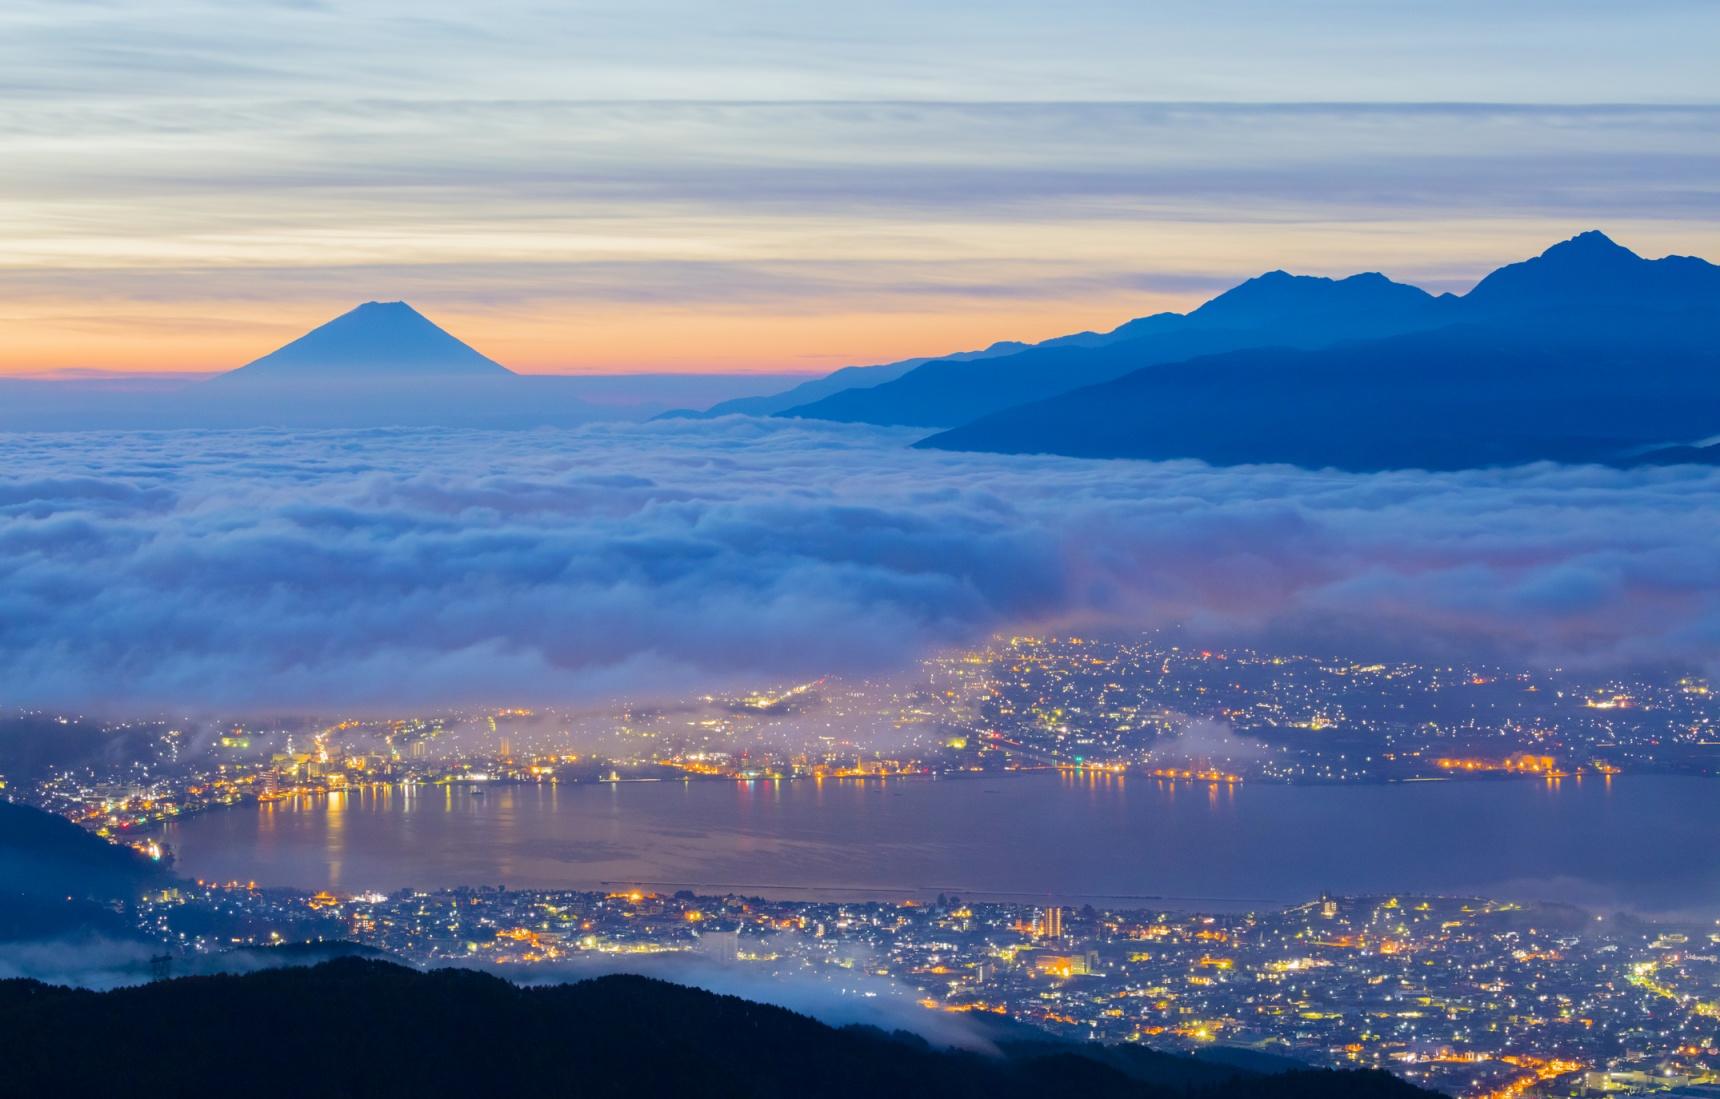 Amazing!20段日本最美夜景的延时摄影视频大合辑